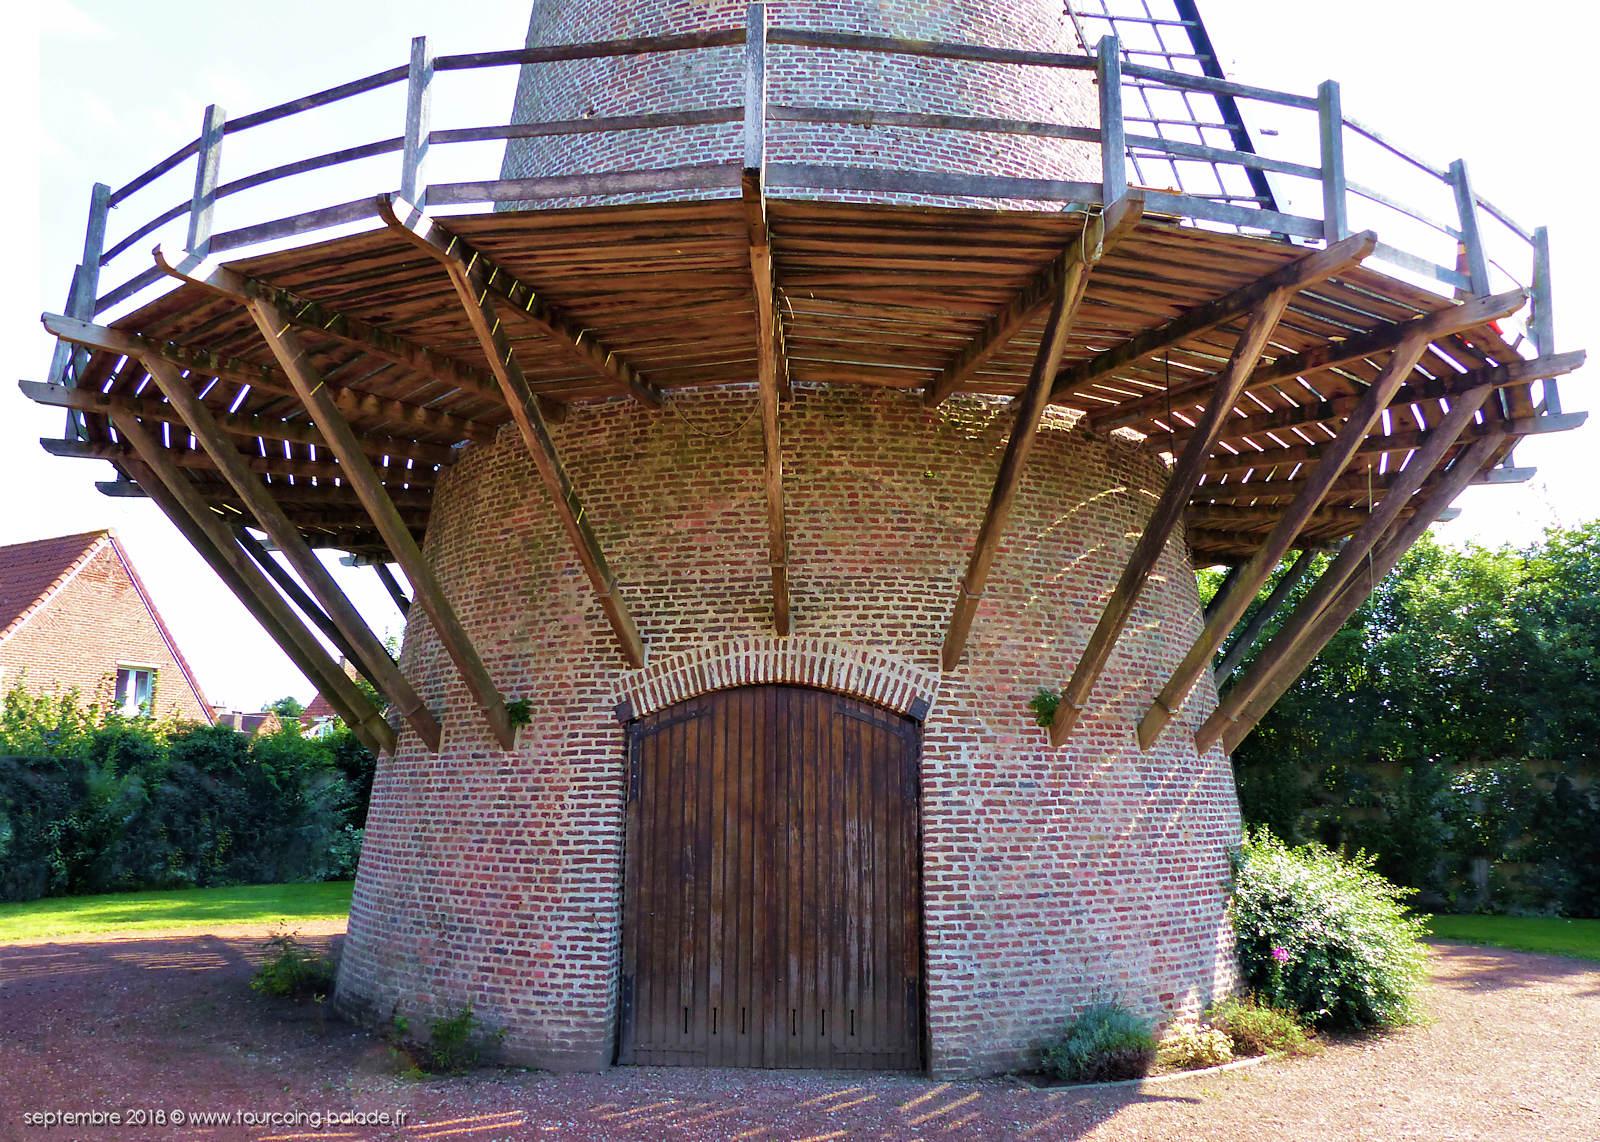 Moulin à plateforme ou à galerie - Halluin